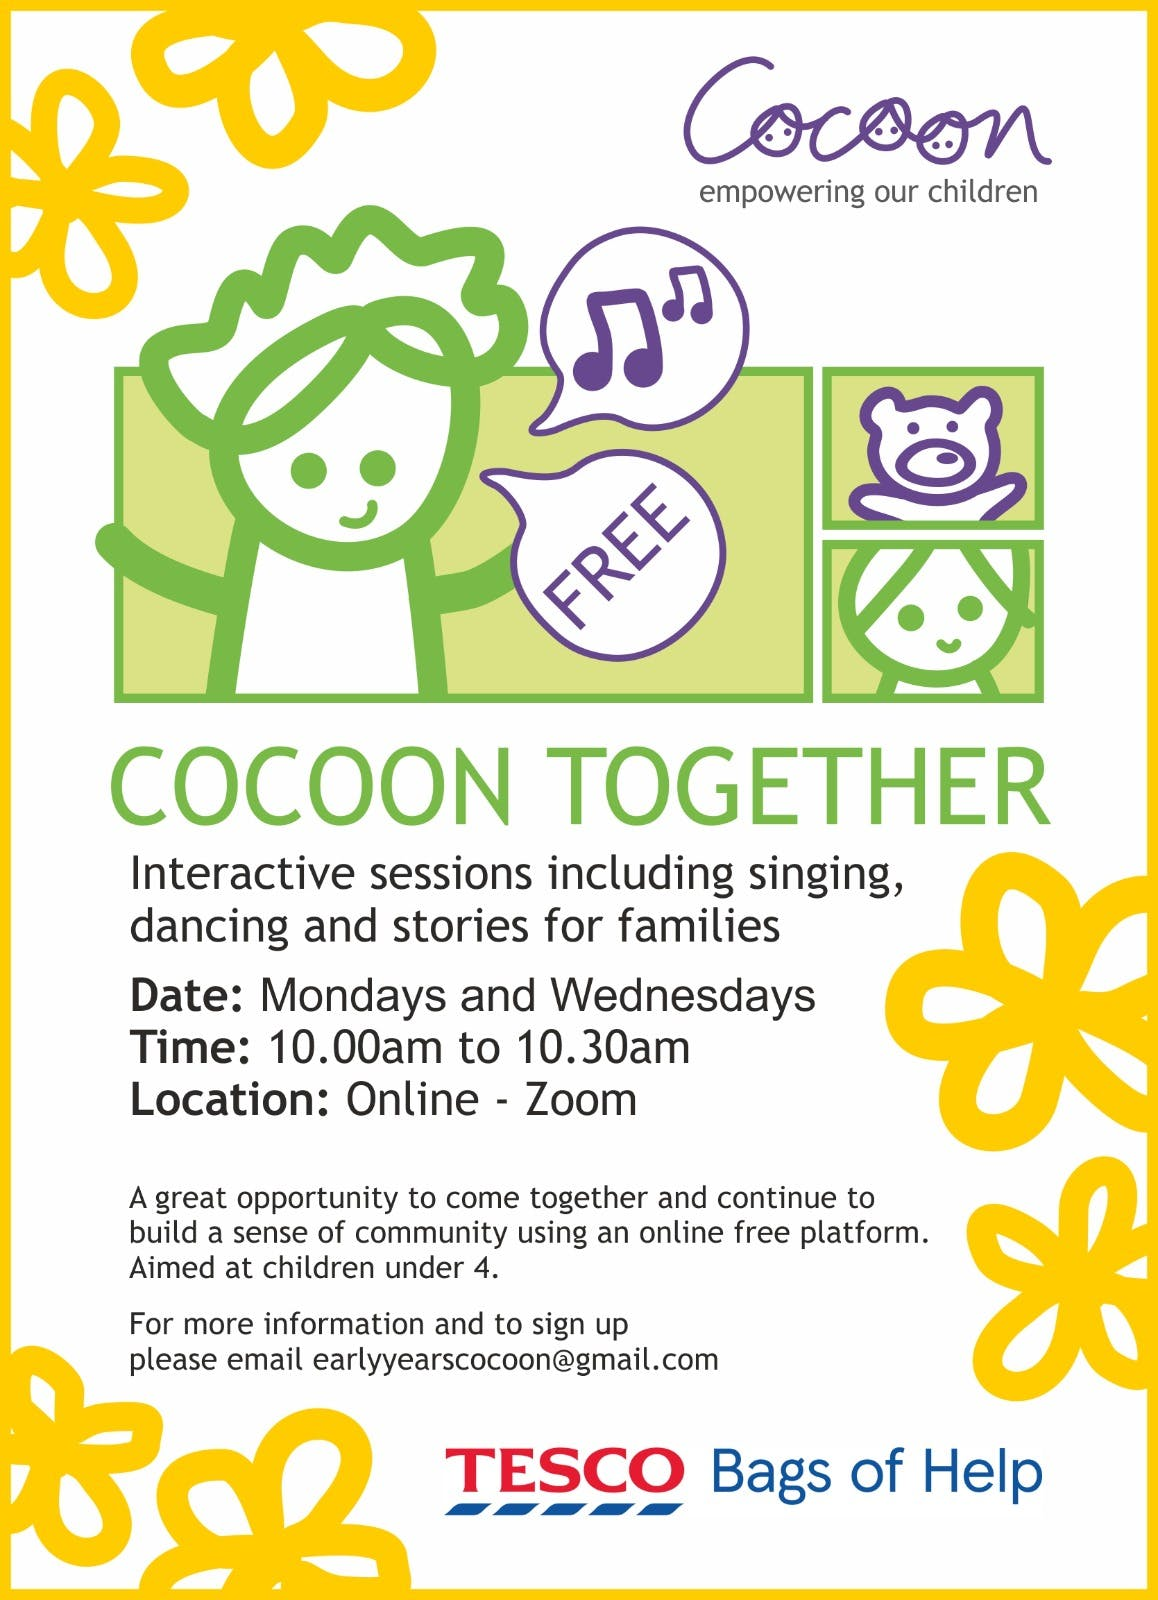 Spring Cocoon Together programme